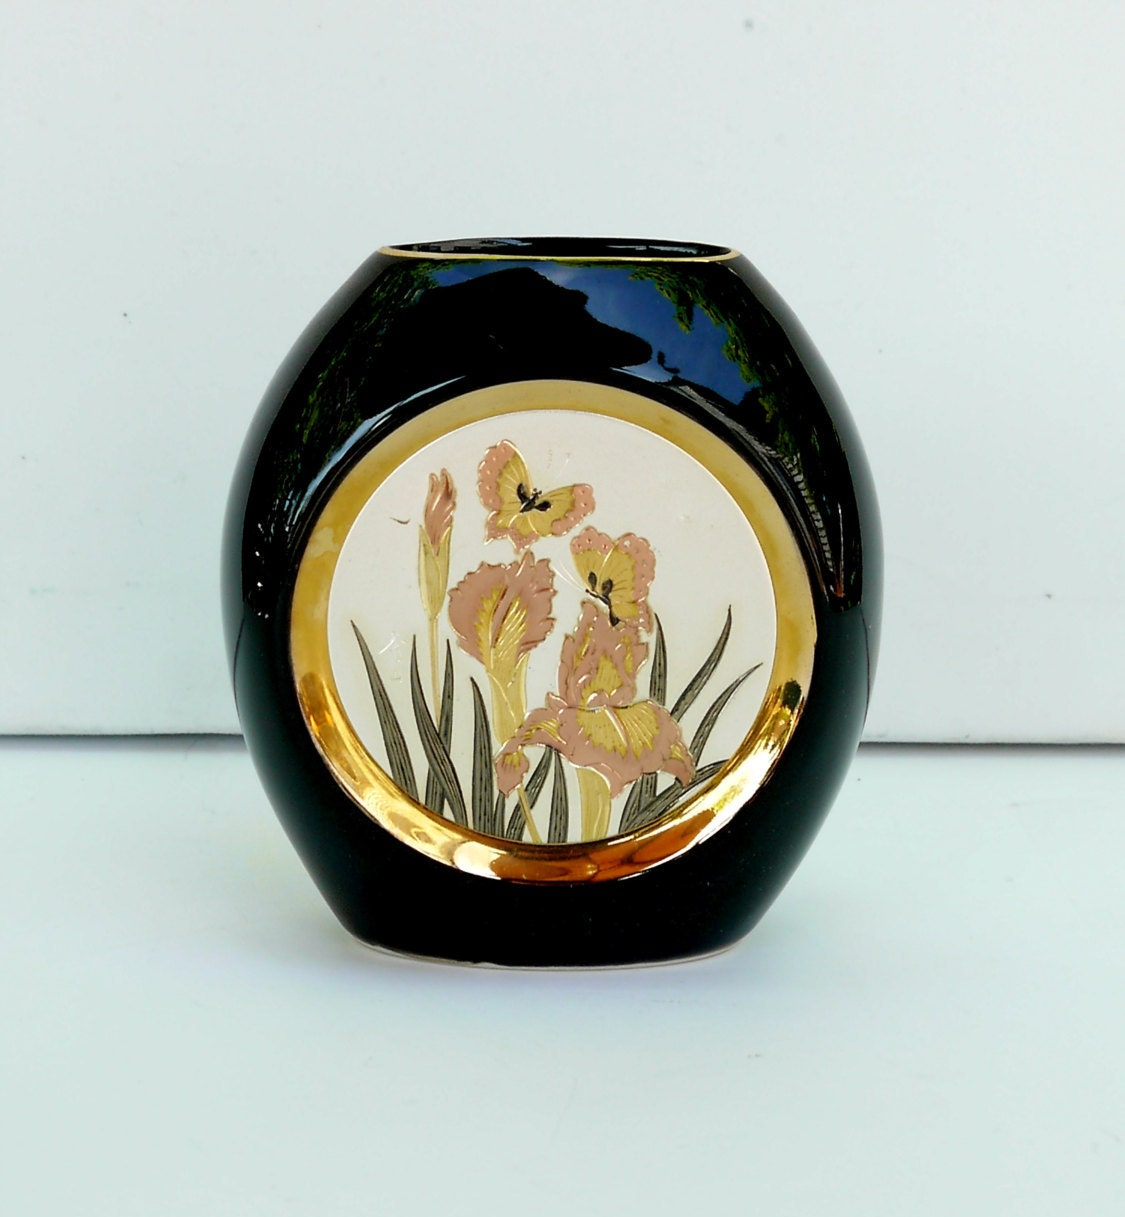 Japan The Art Of Chokin Small Black Porcelain Vase 24K Gold